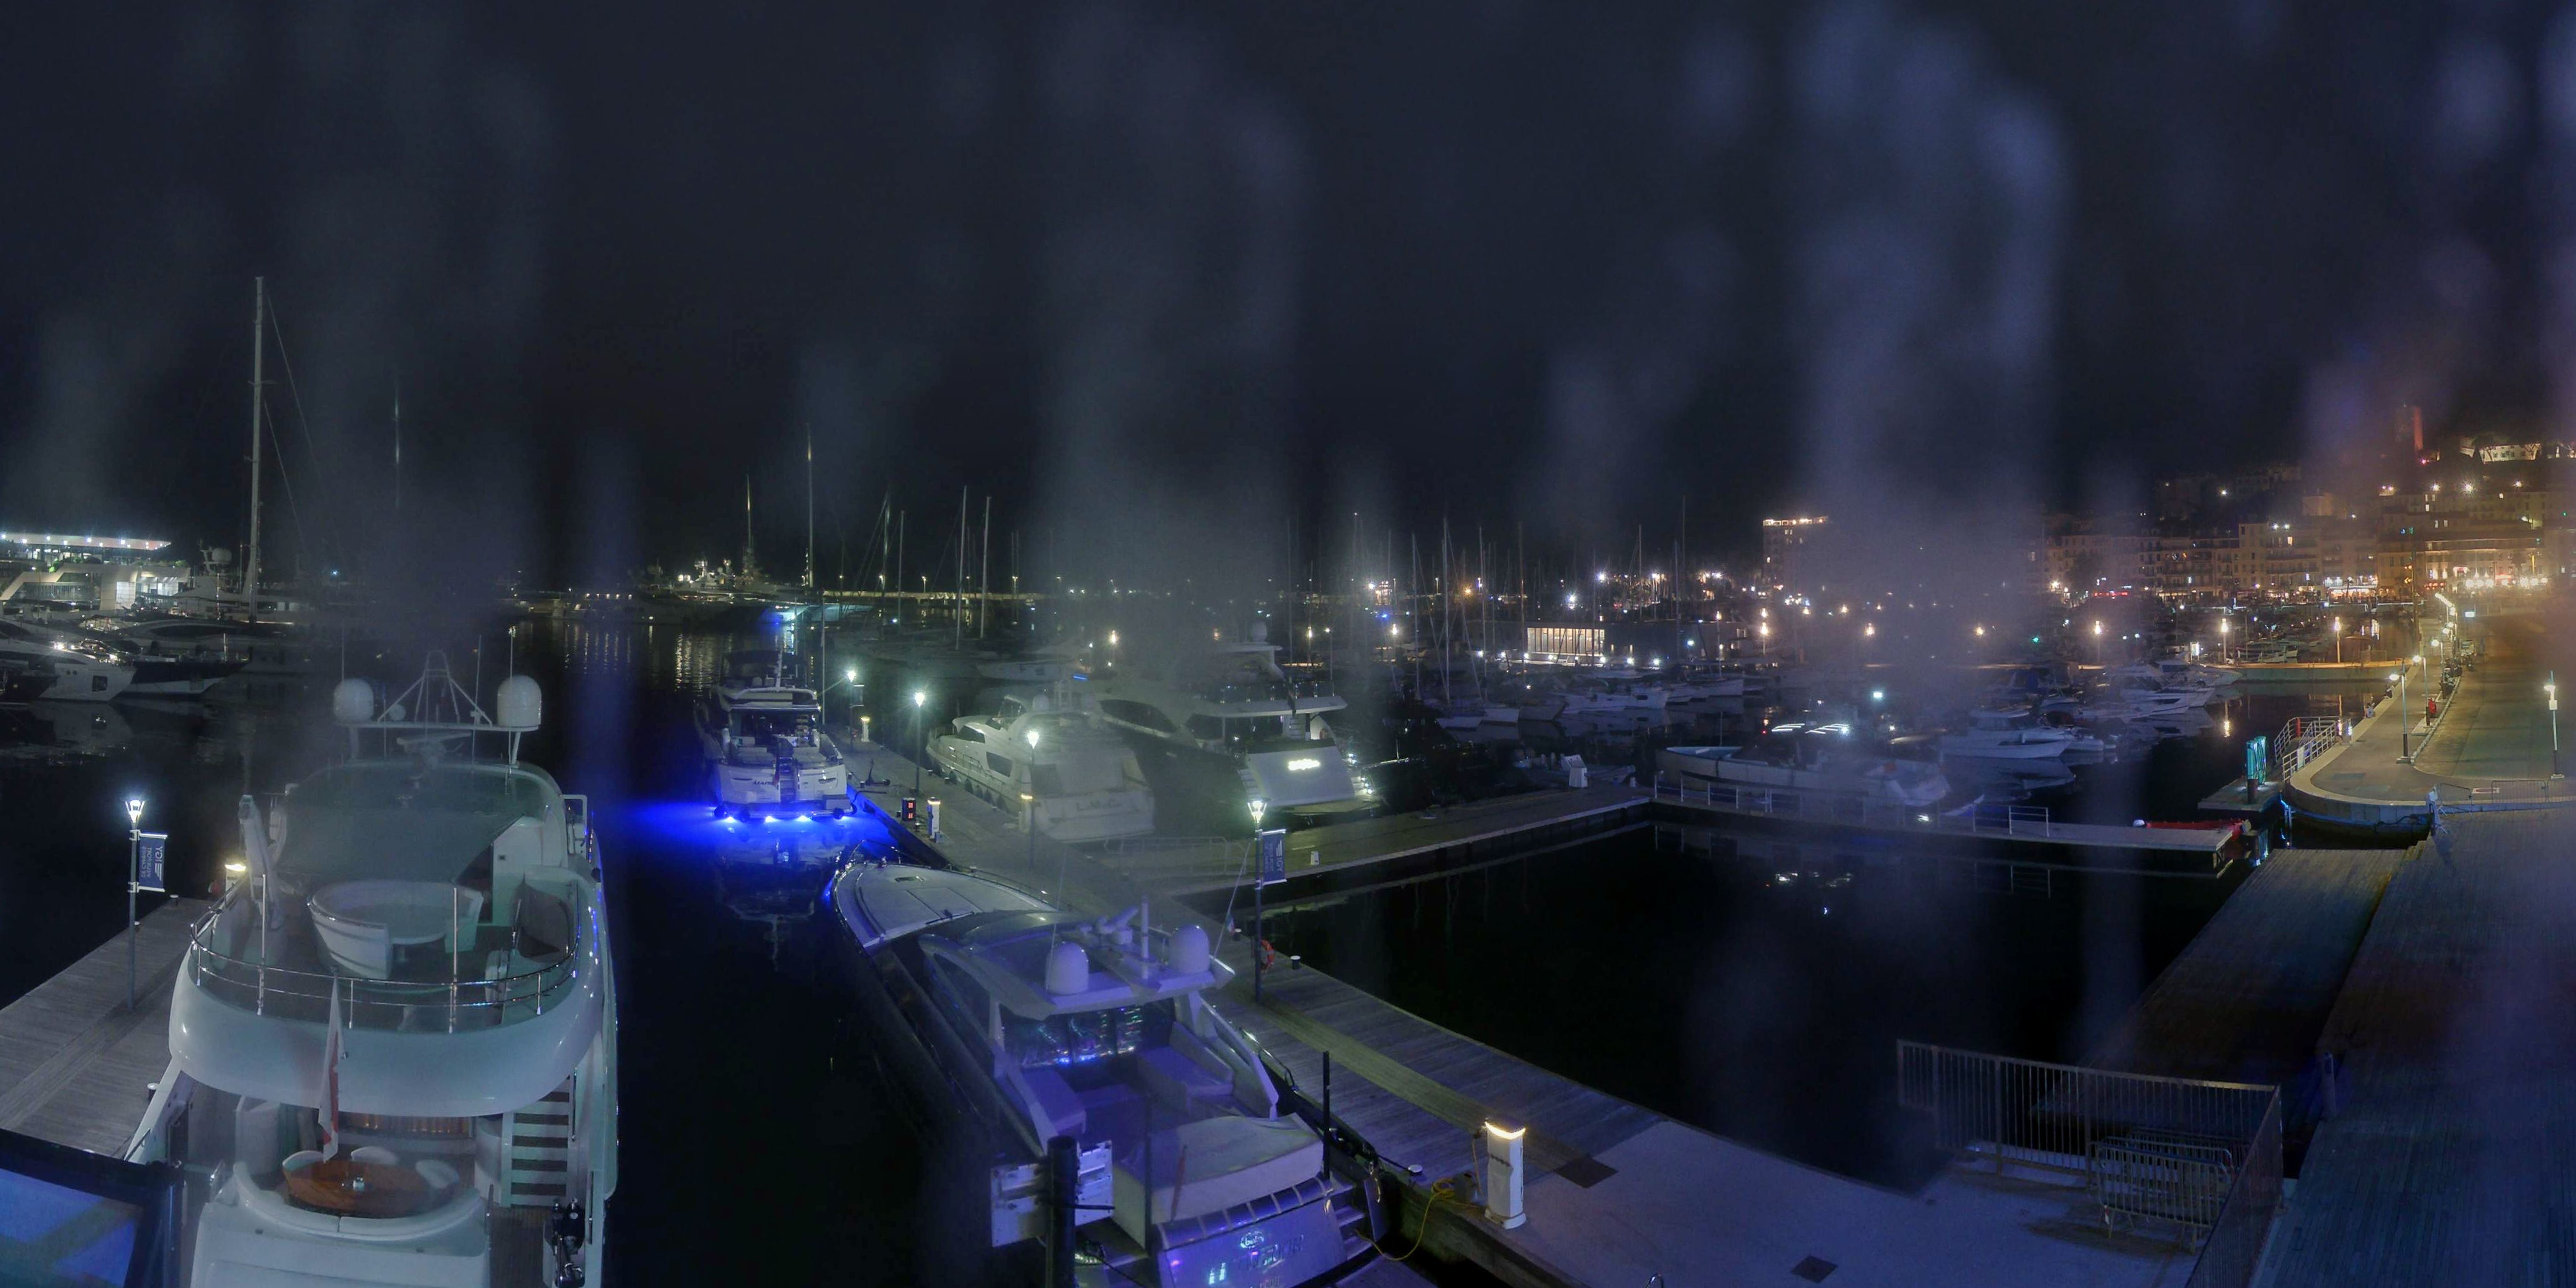 Cannes Thu. 01:35